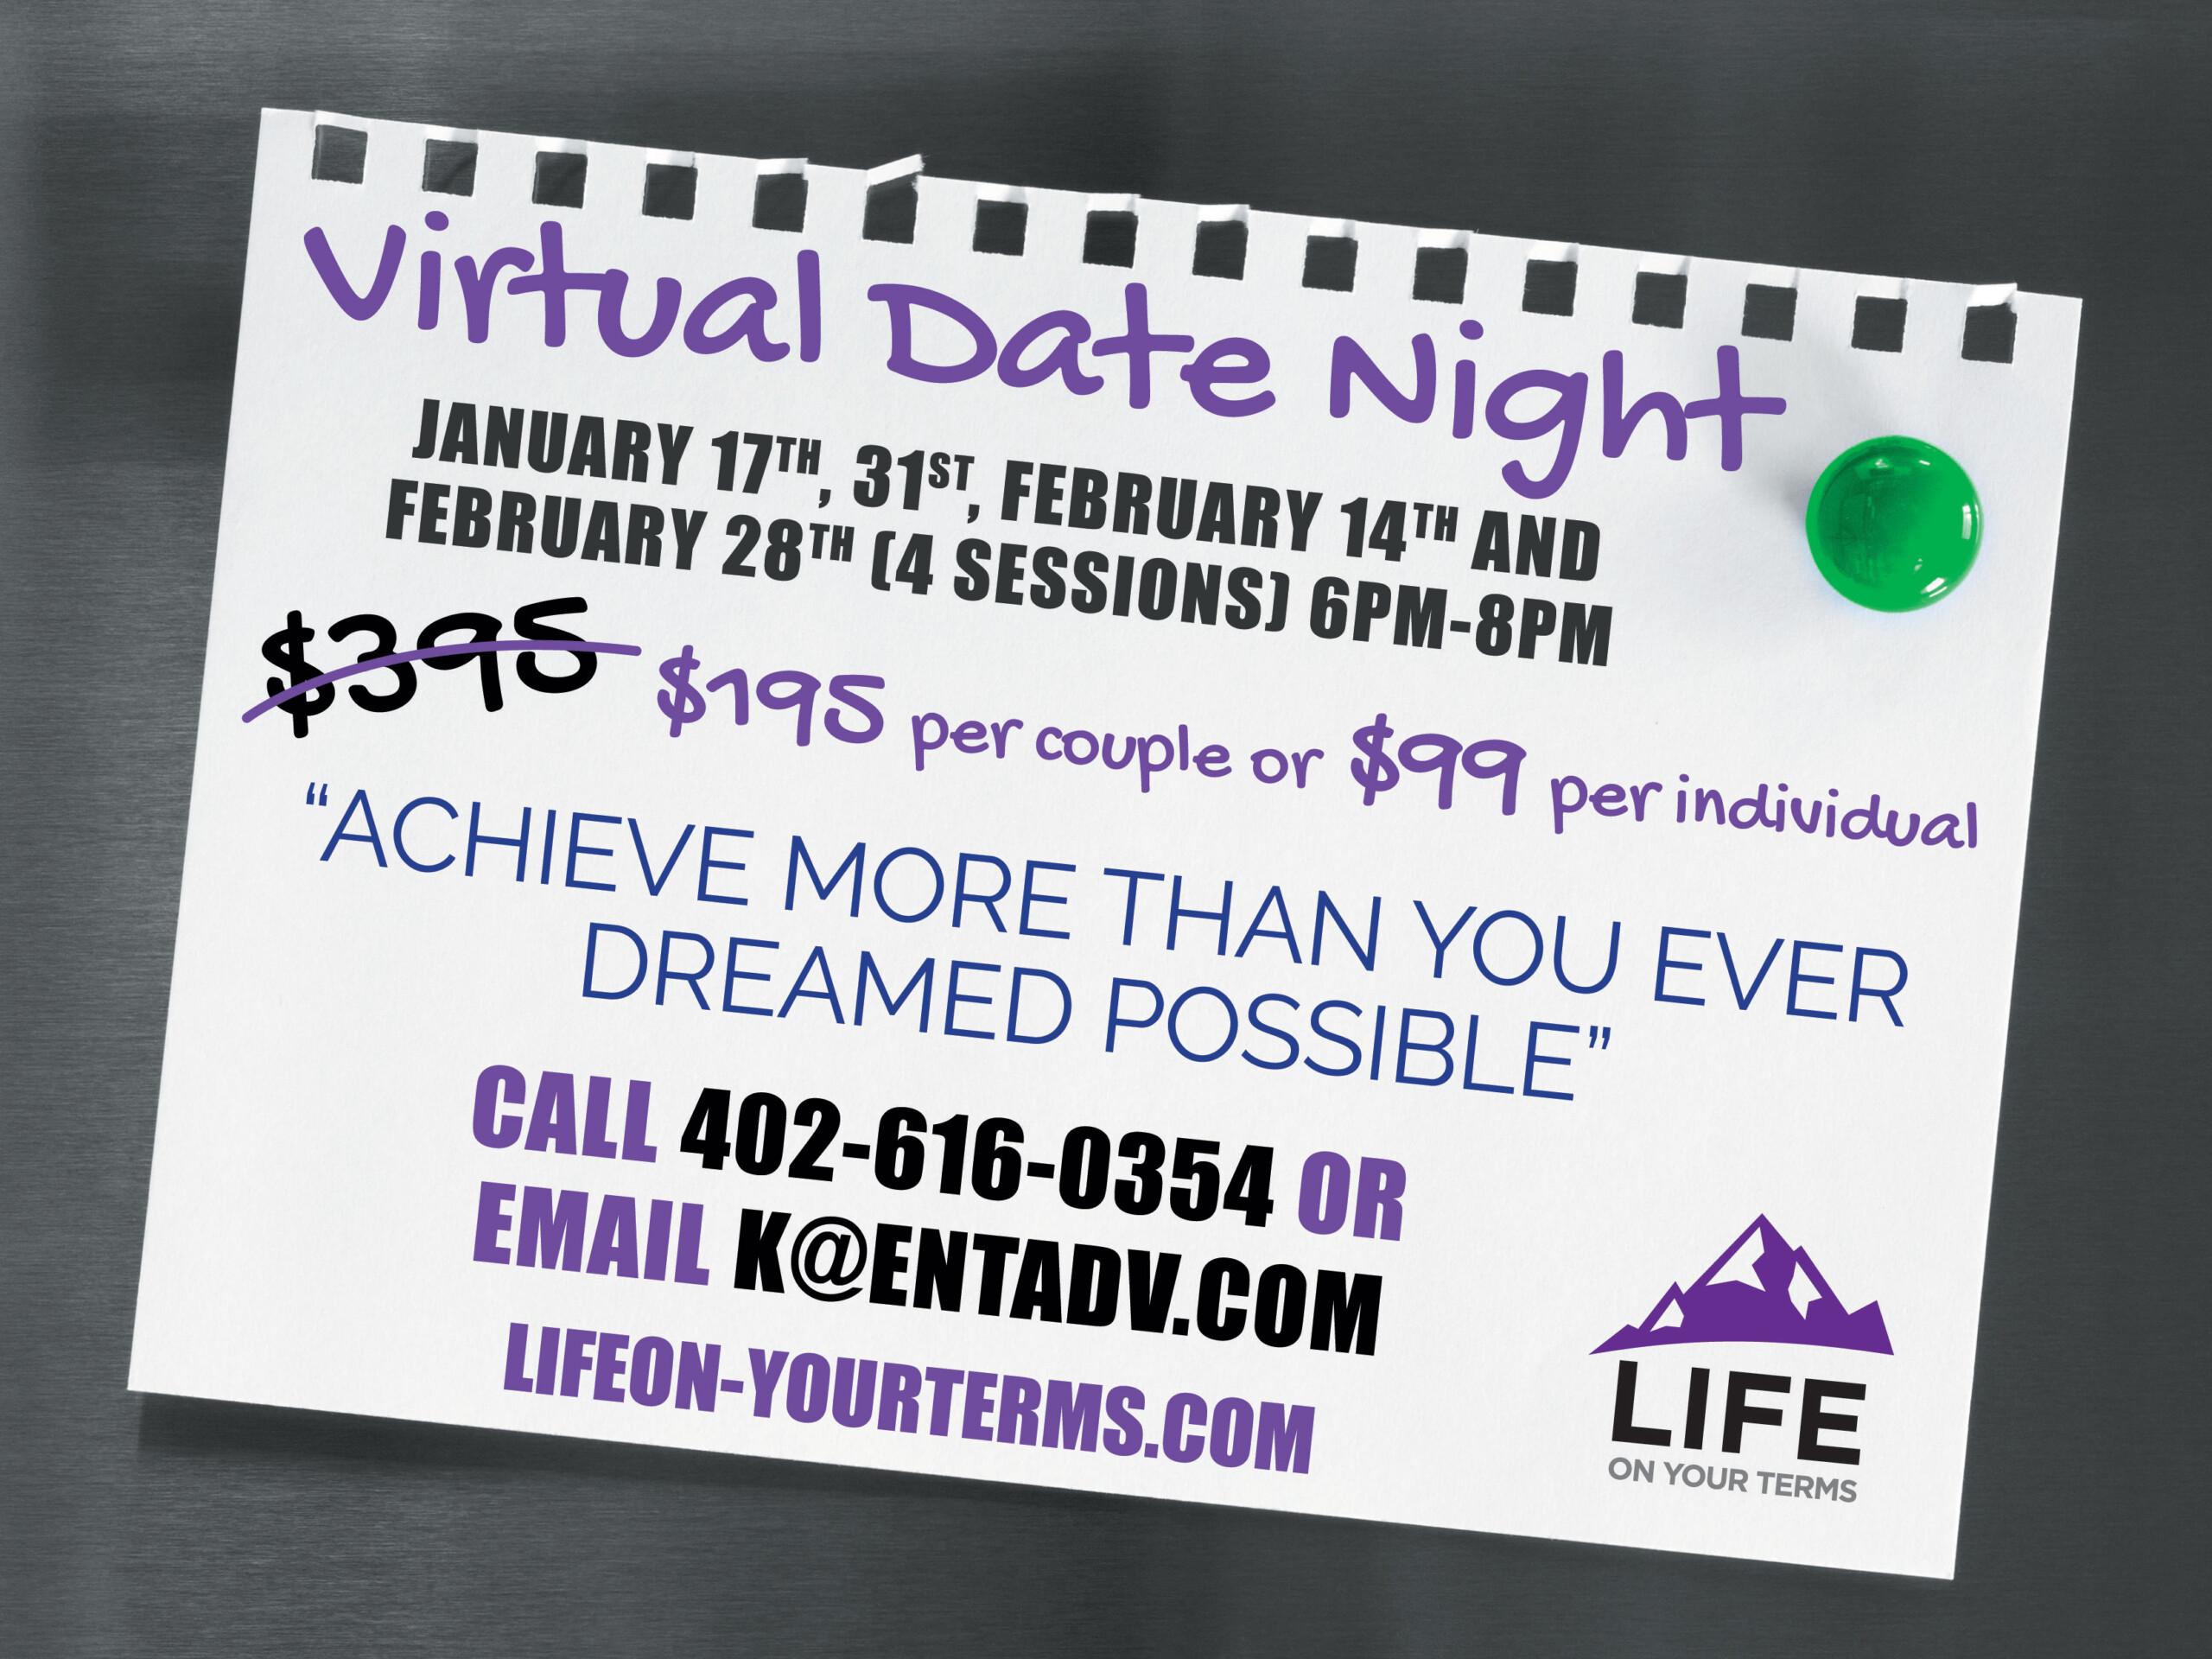 Date-Night-Social-Advert-Jan-17th-WEB